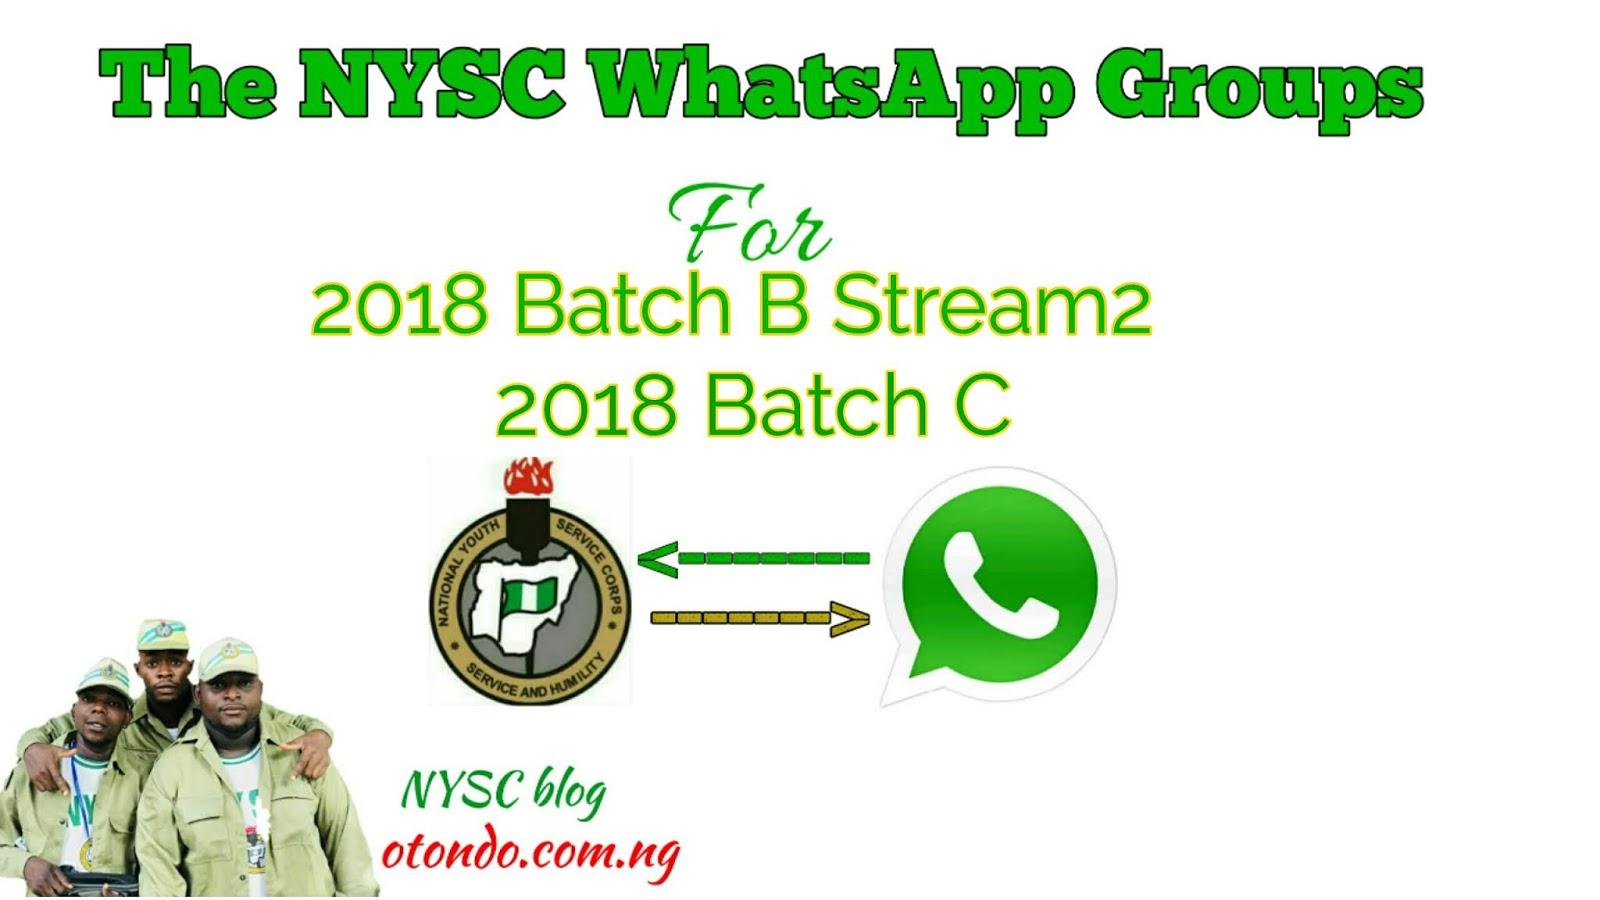 National Whatsapp Group